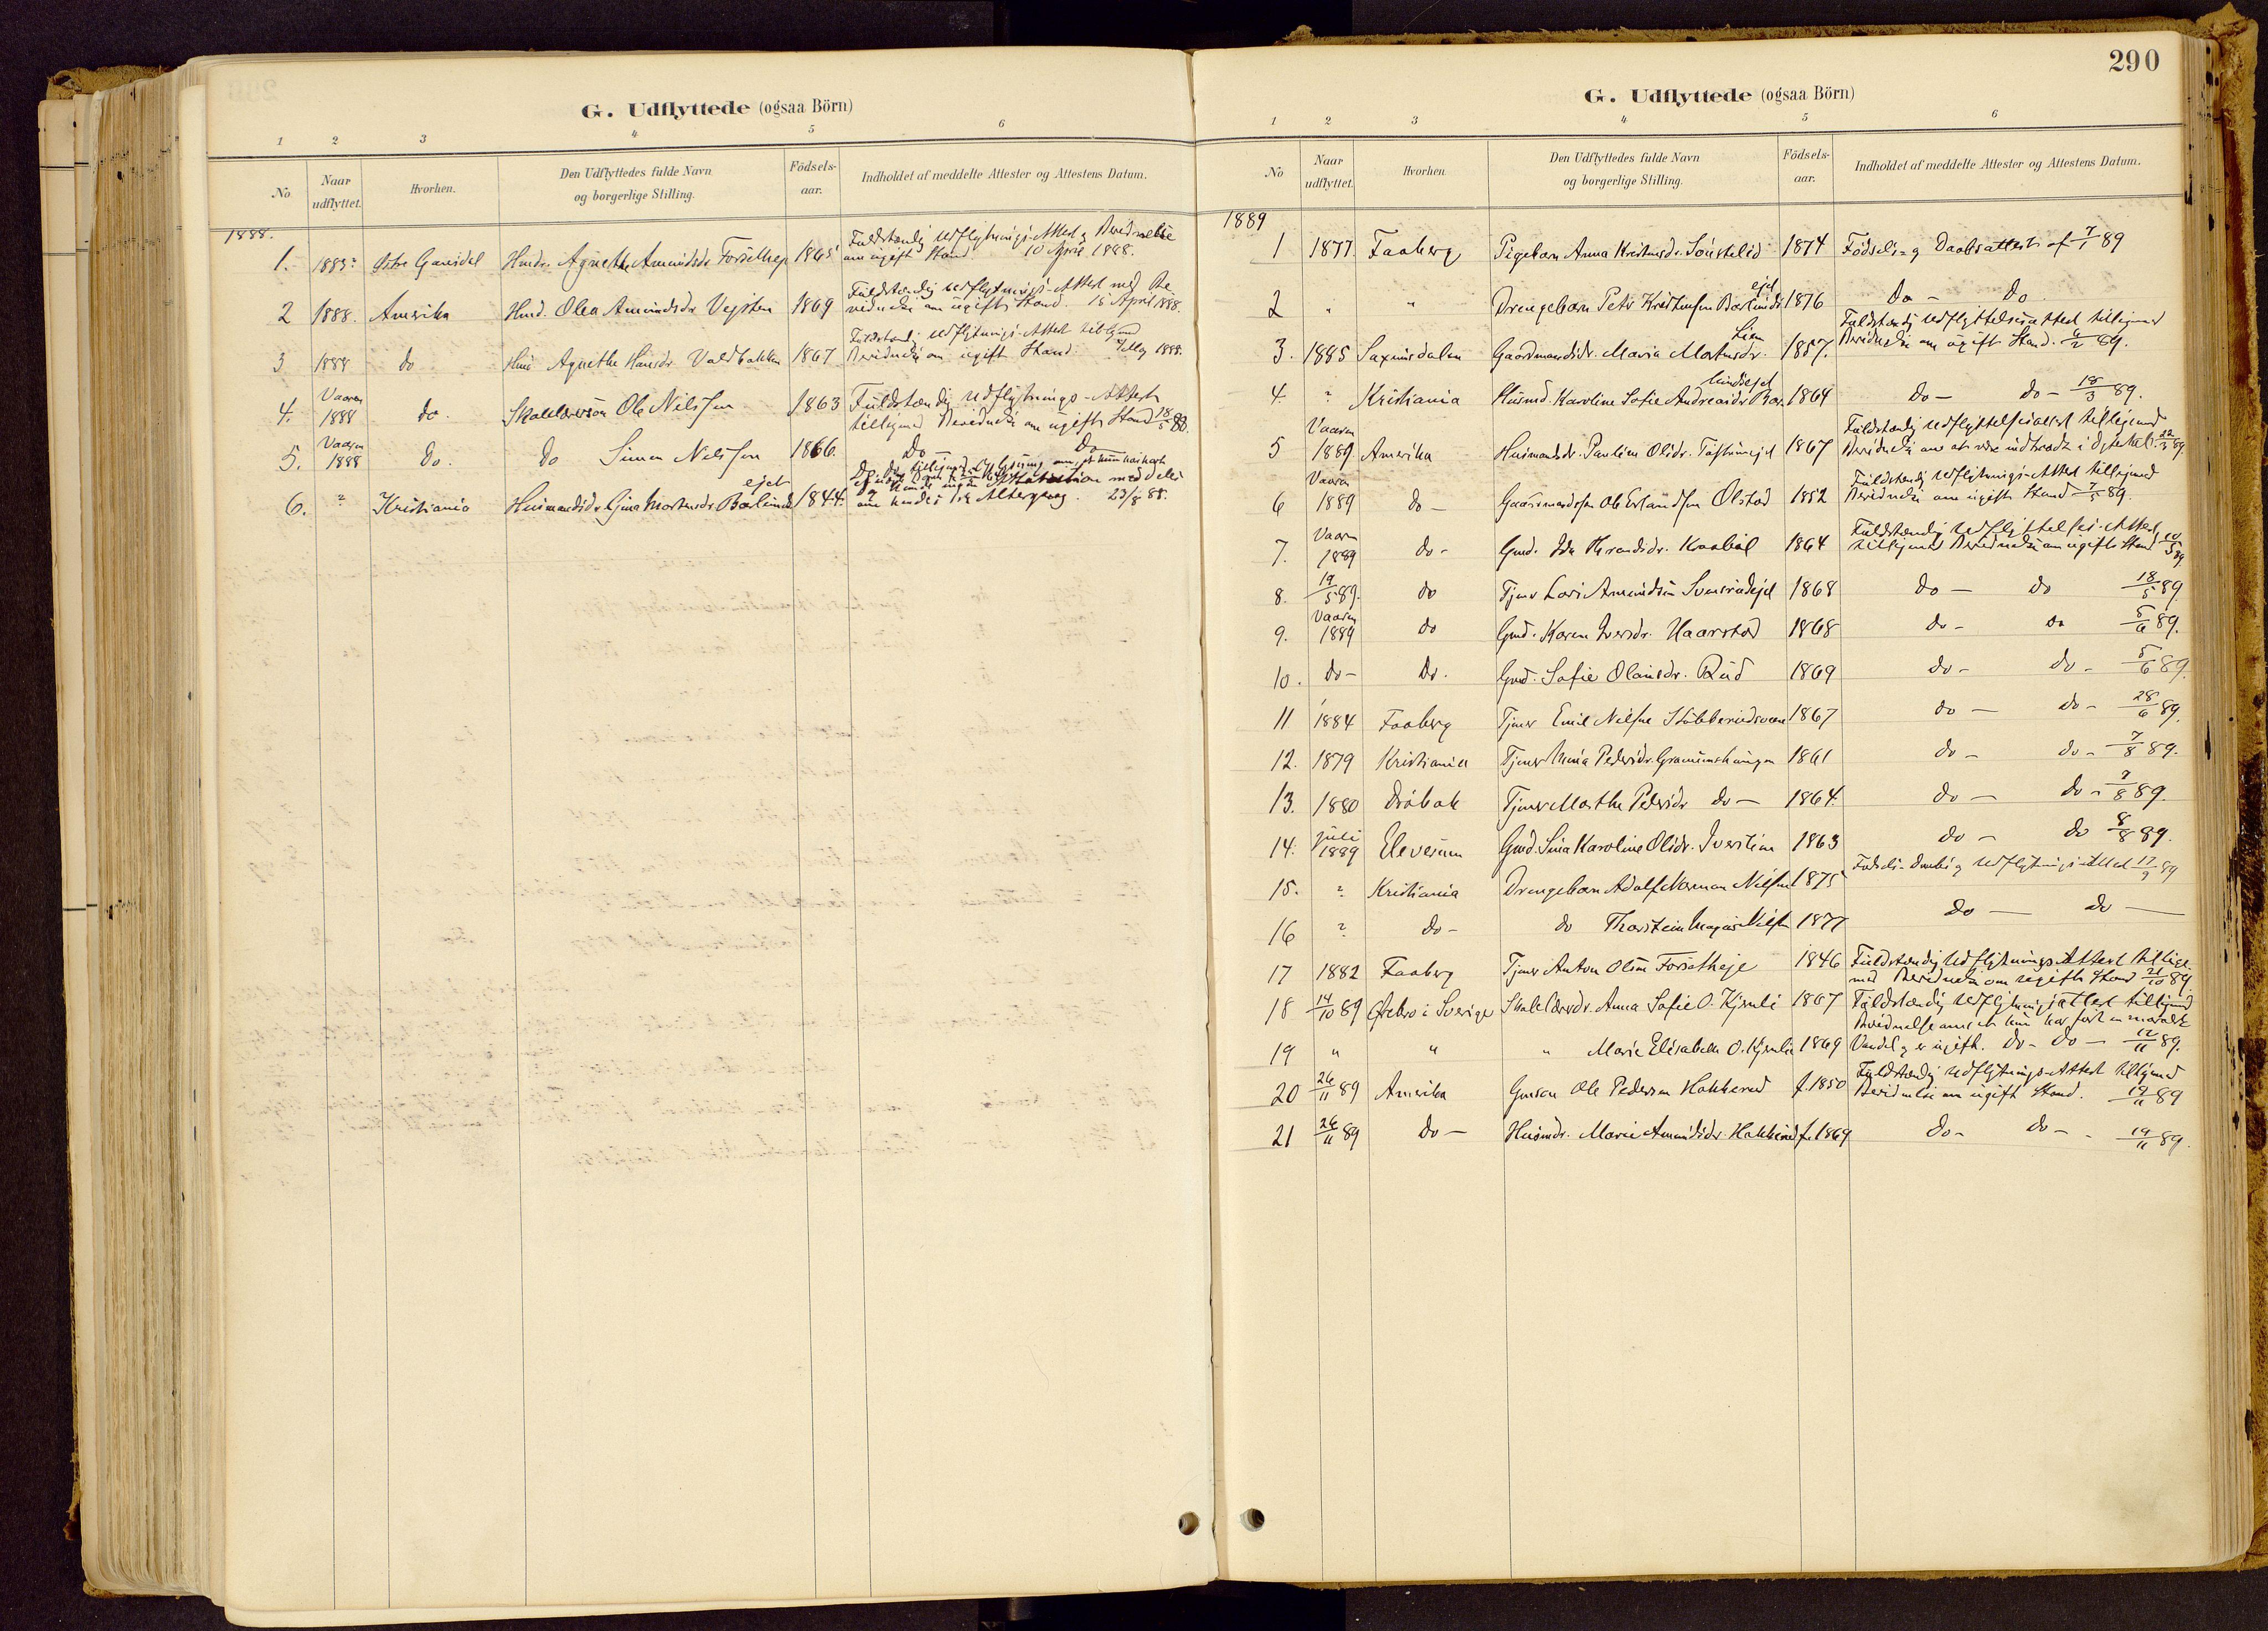 SAH, Vestre Gausdal prestekontor, Ministerialbok nr. 1, 1887-1914, s. 290